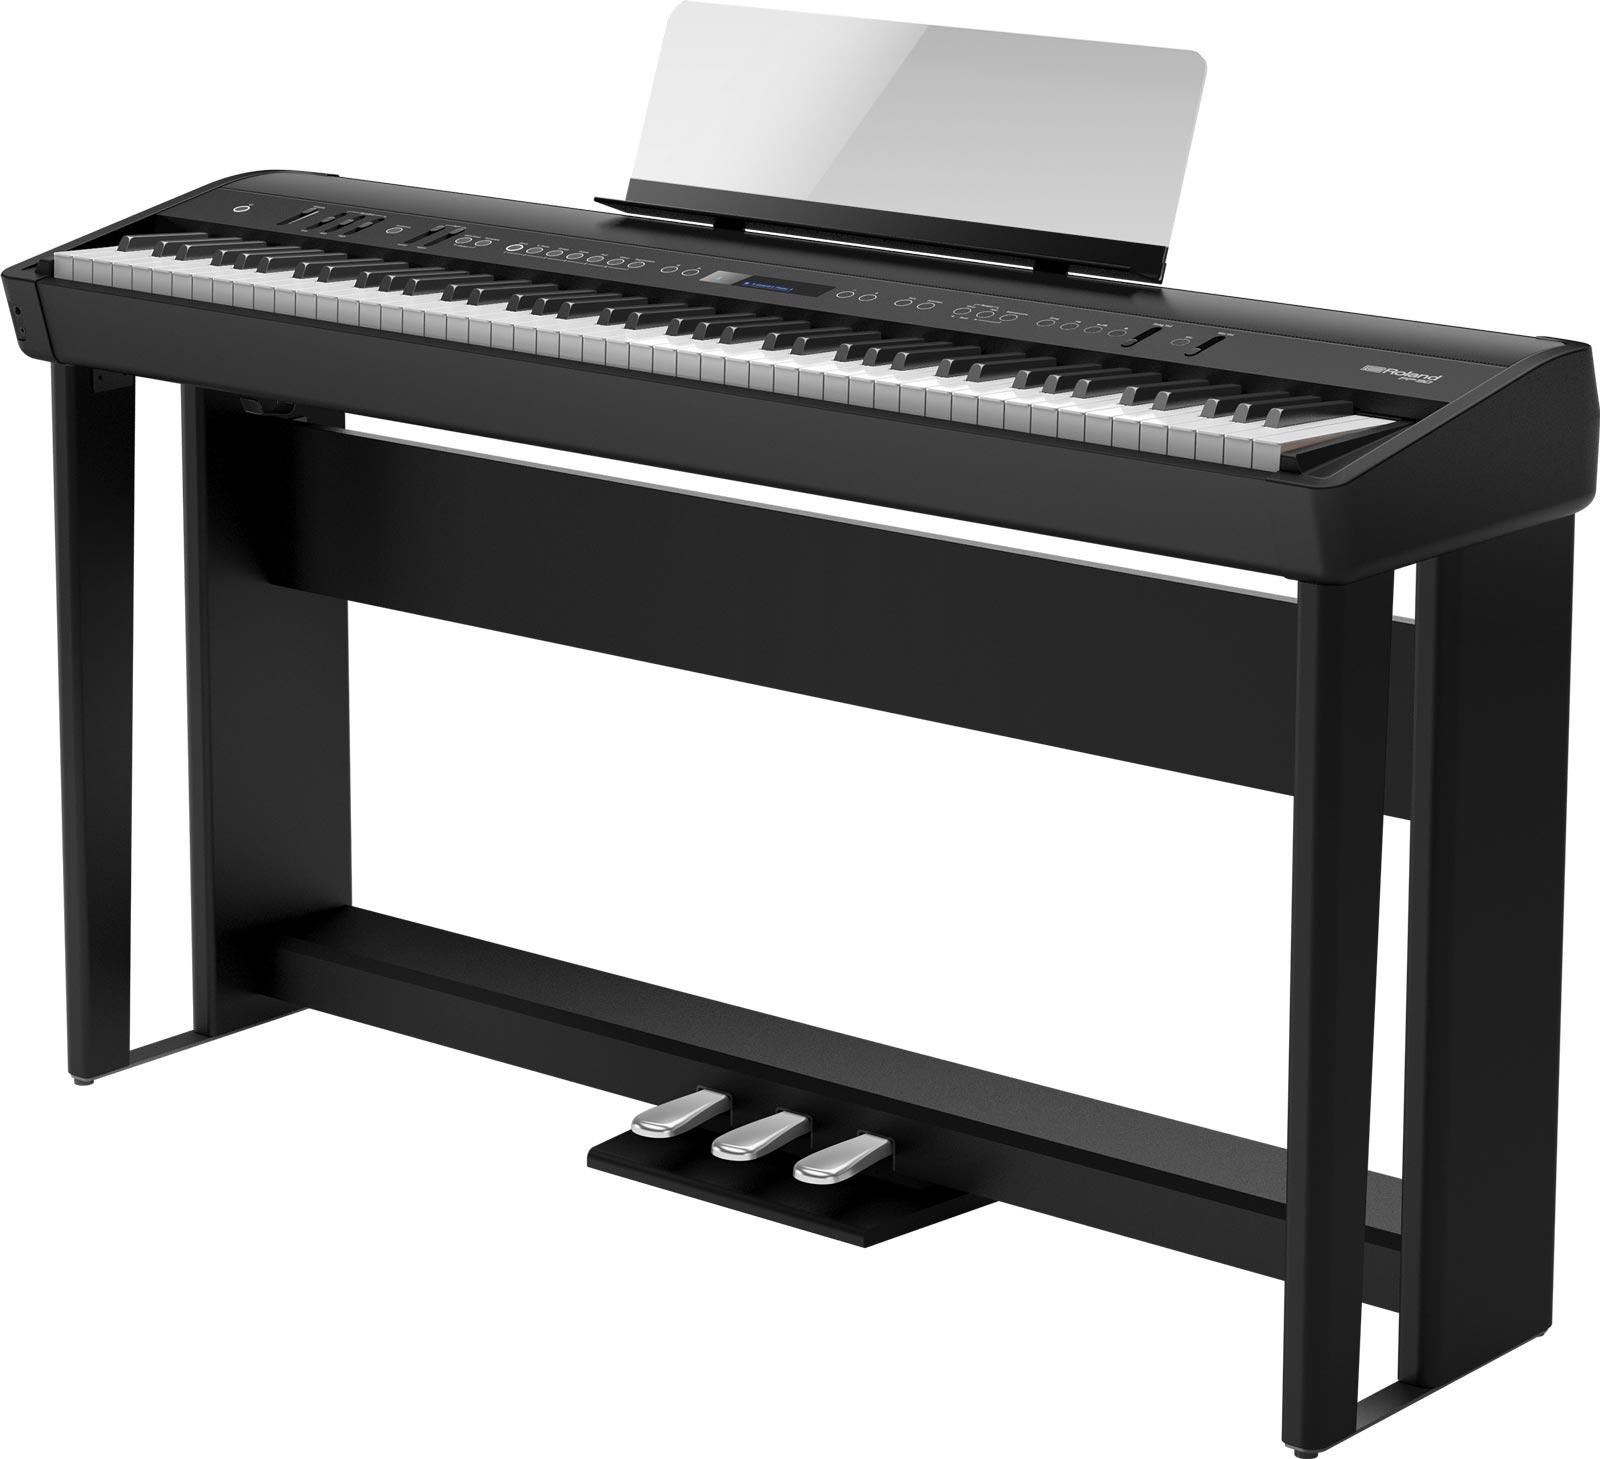 Roland FP-90 旗艦款電鋼琴